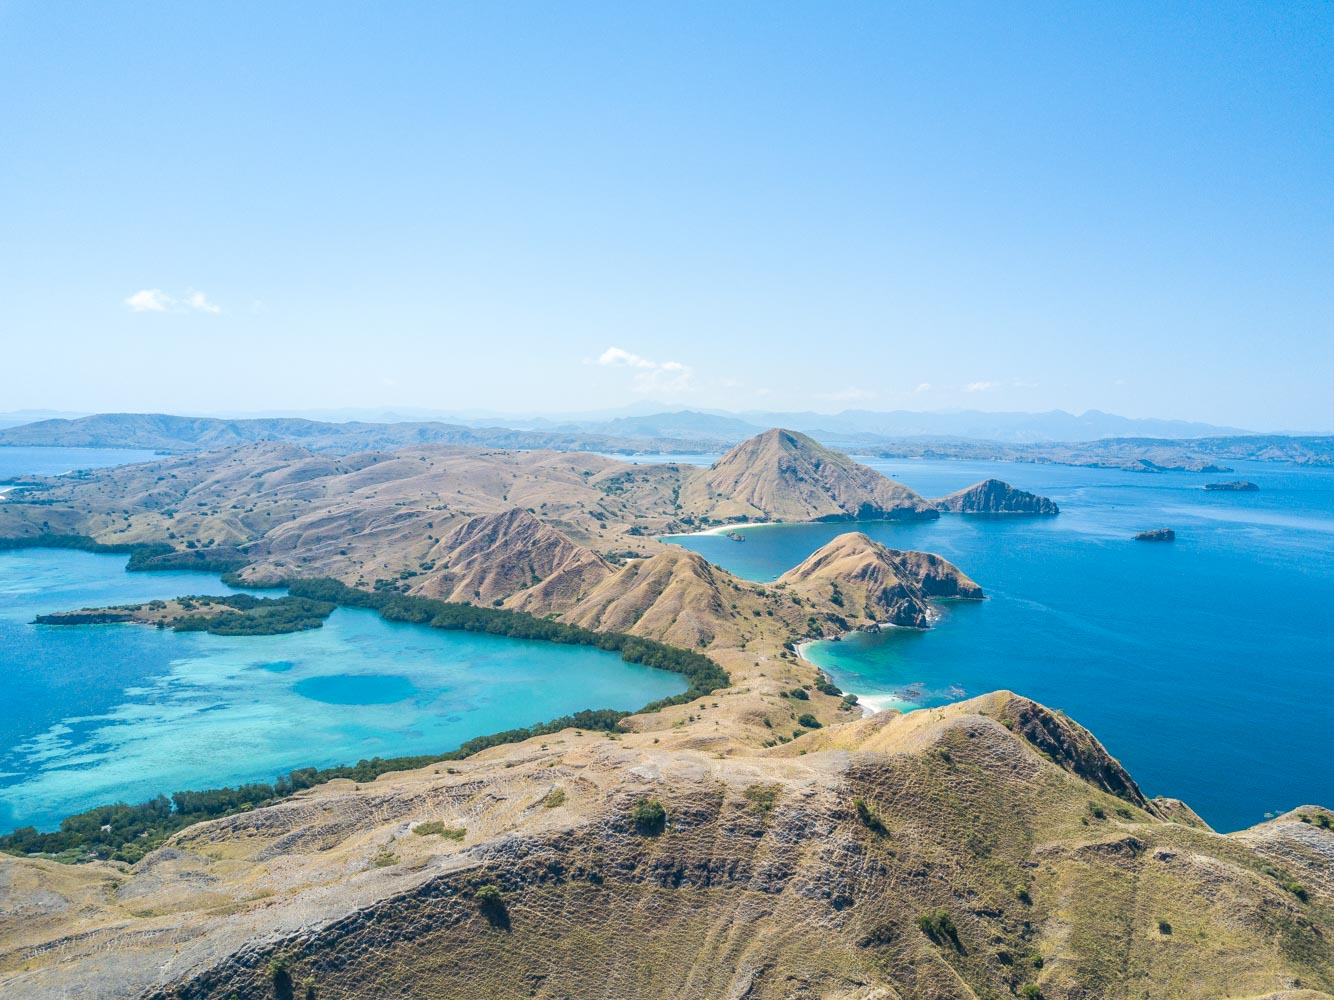 kelana_boat_cruise_landscape_padar_island.JPG